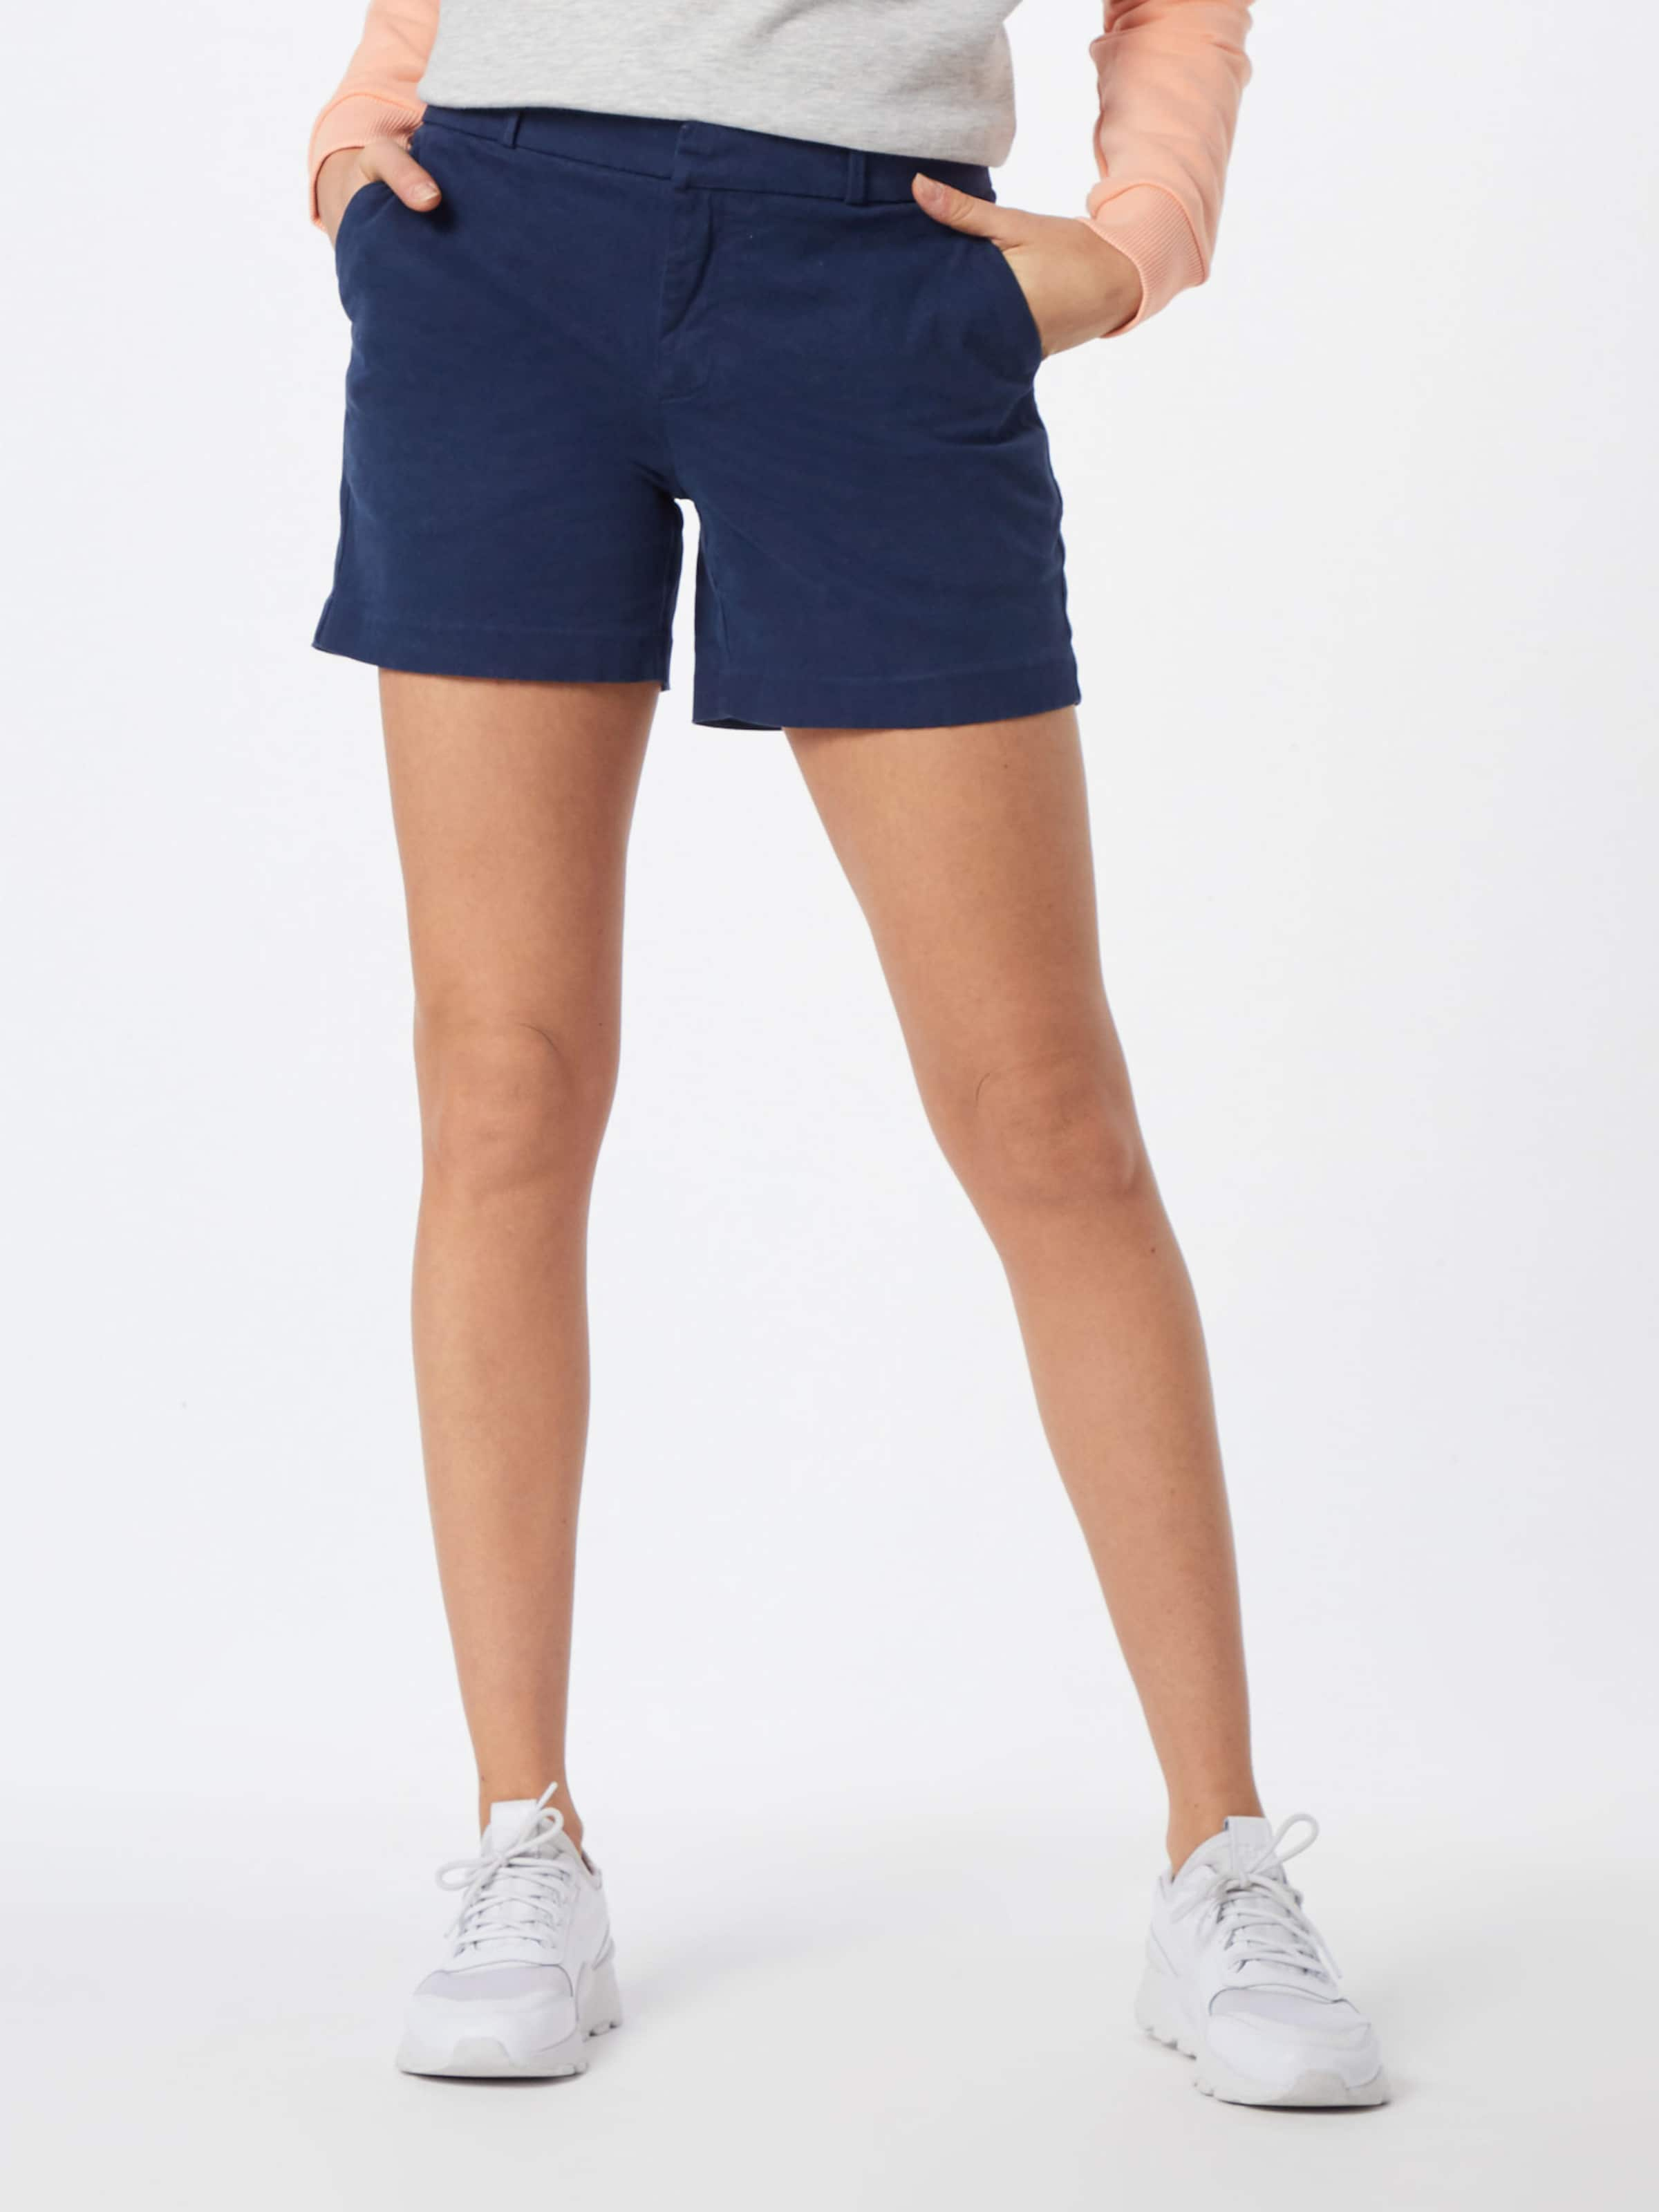 Marine Banana '5 Inch Bleu Republic Pantalon Chino' En Chino 3AjLS5Rc4q